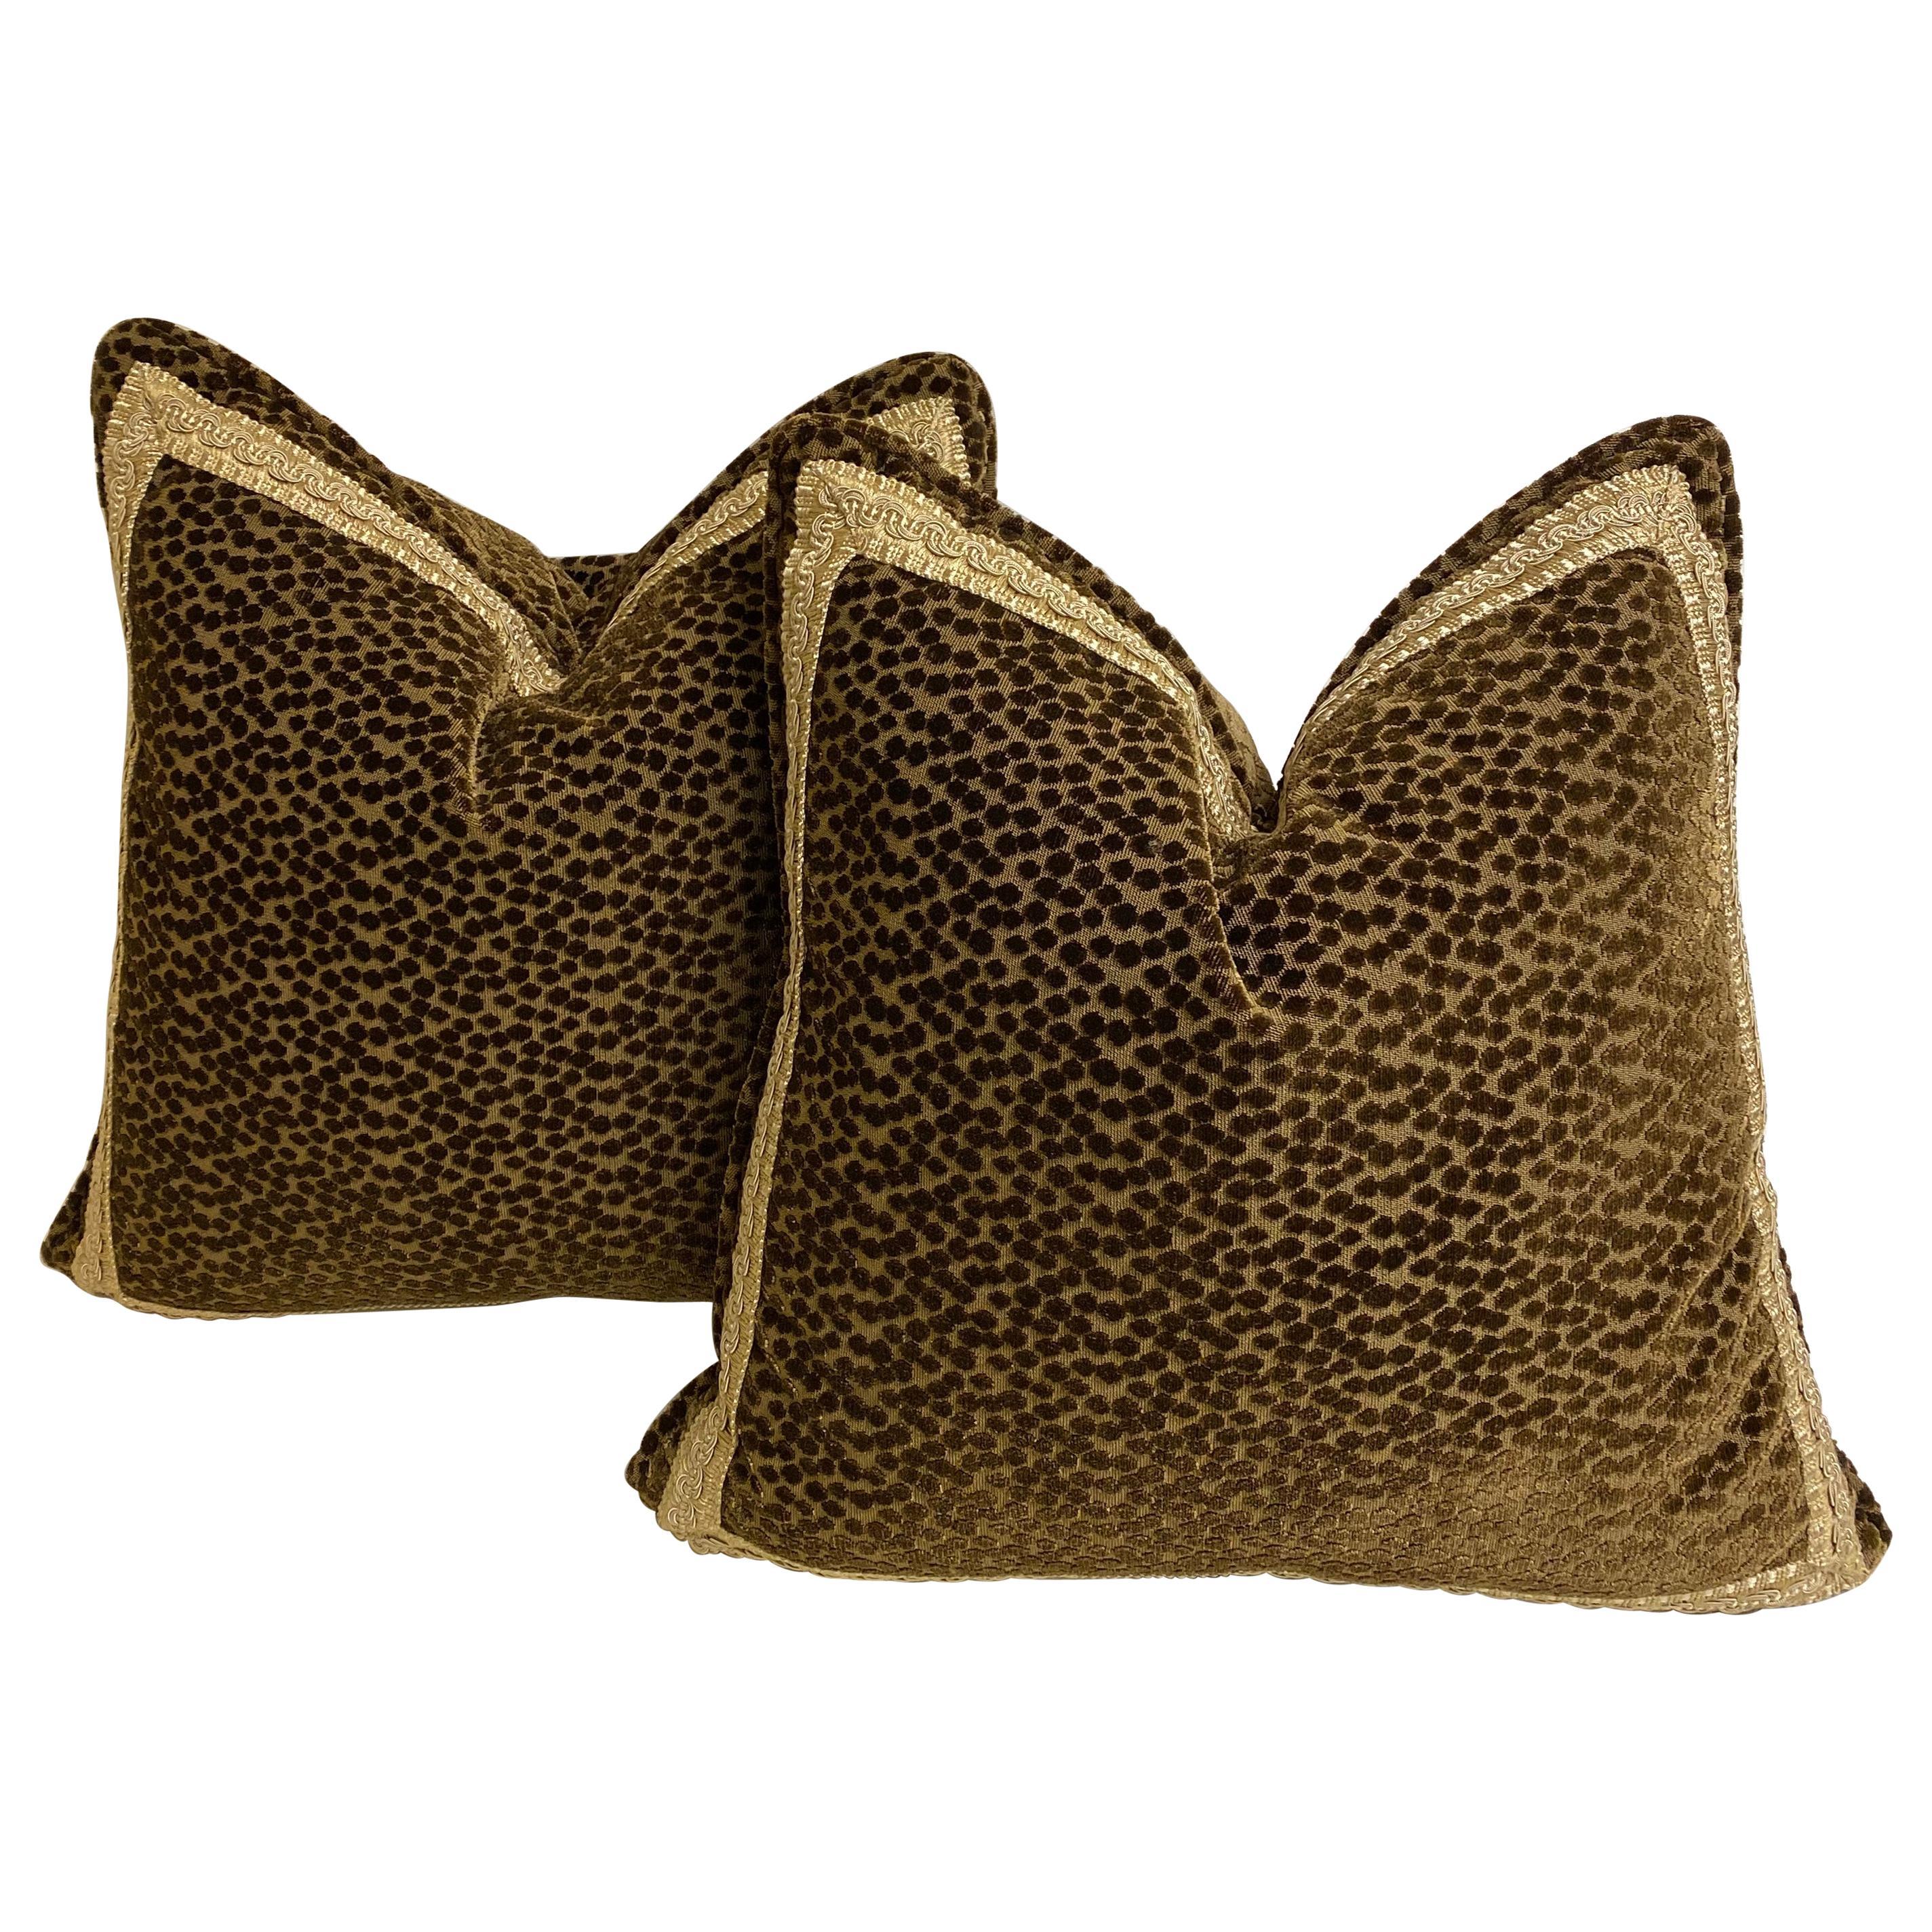 Pair of Dark Brown Cut-Velvet Cushions with Gold Trim